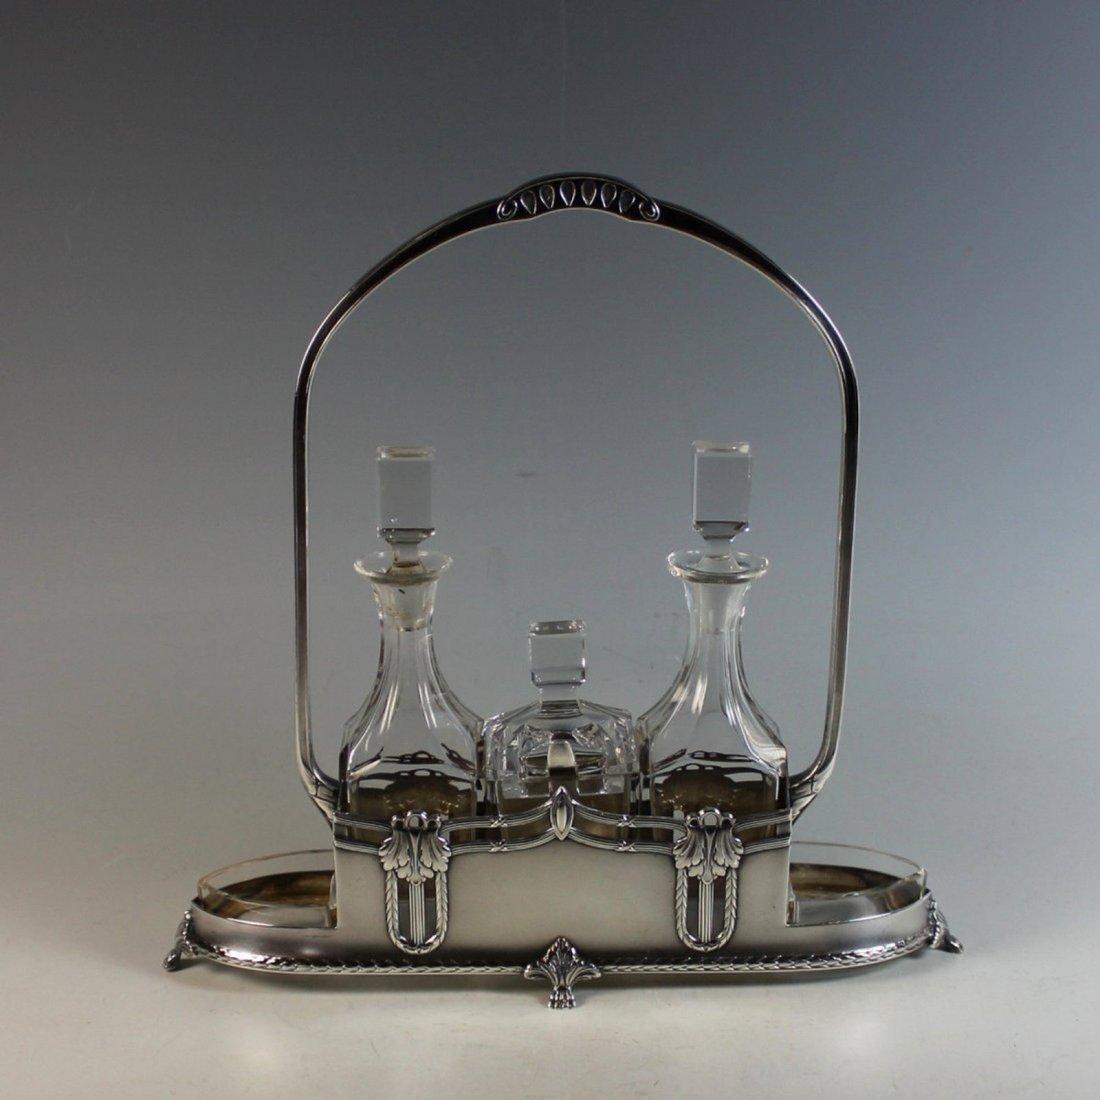 WMF Silver plate Cruet Set 1910-1918